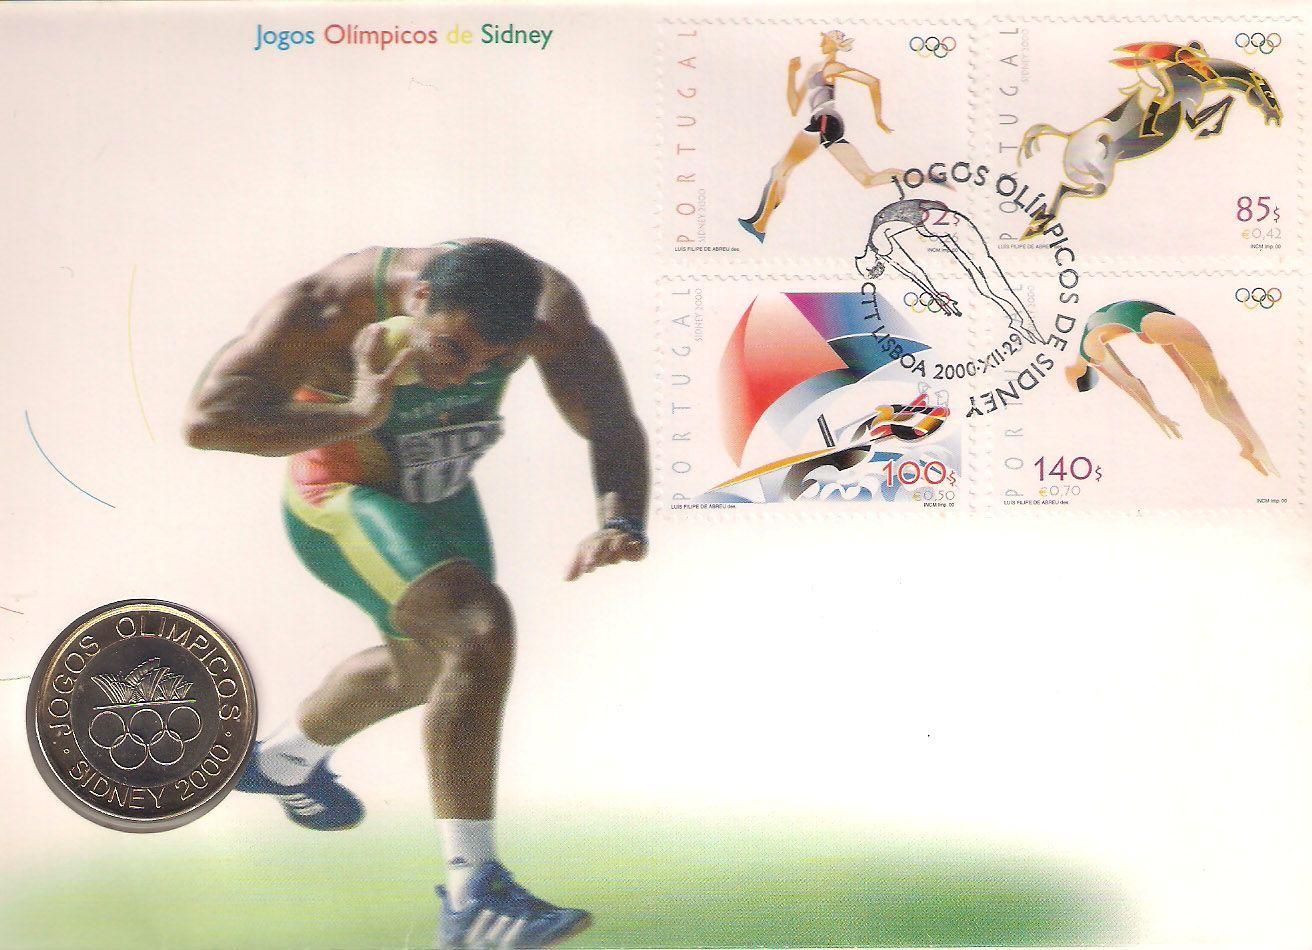 Jogos Olímpicos Sidney - 2000